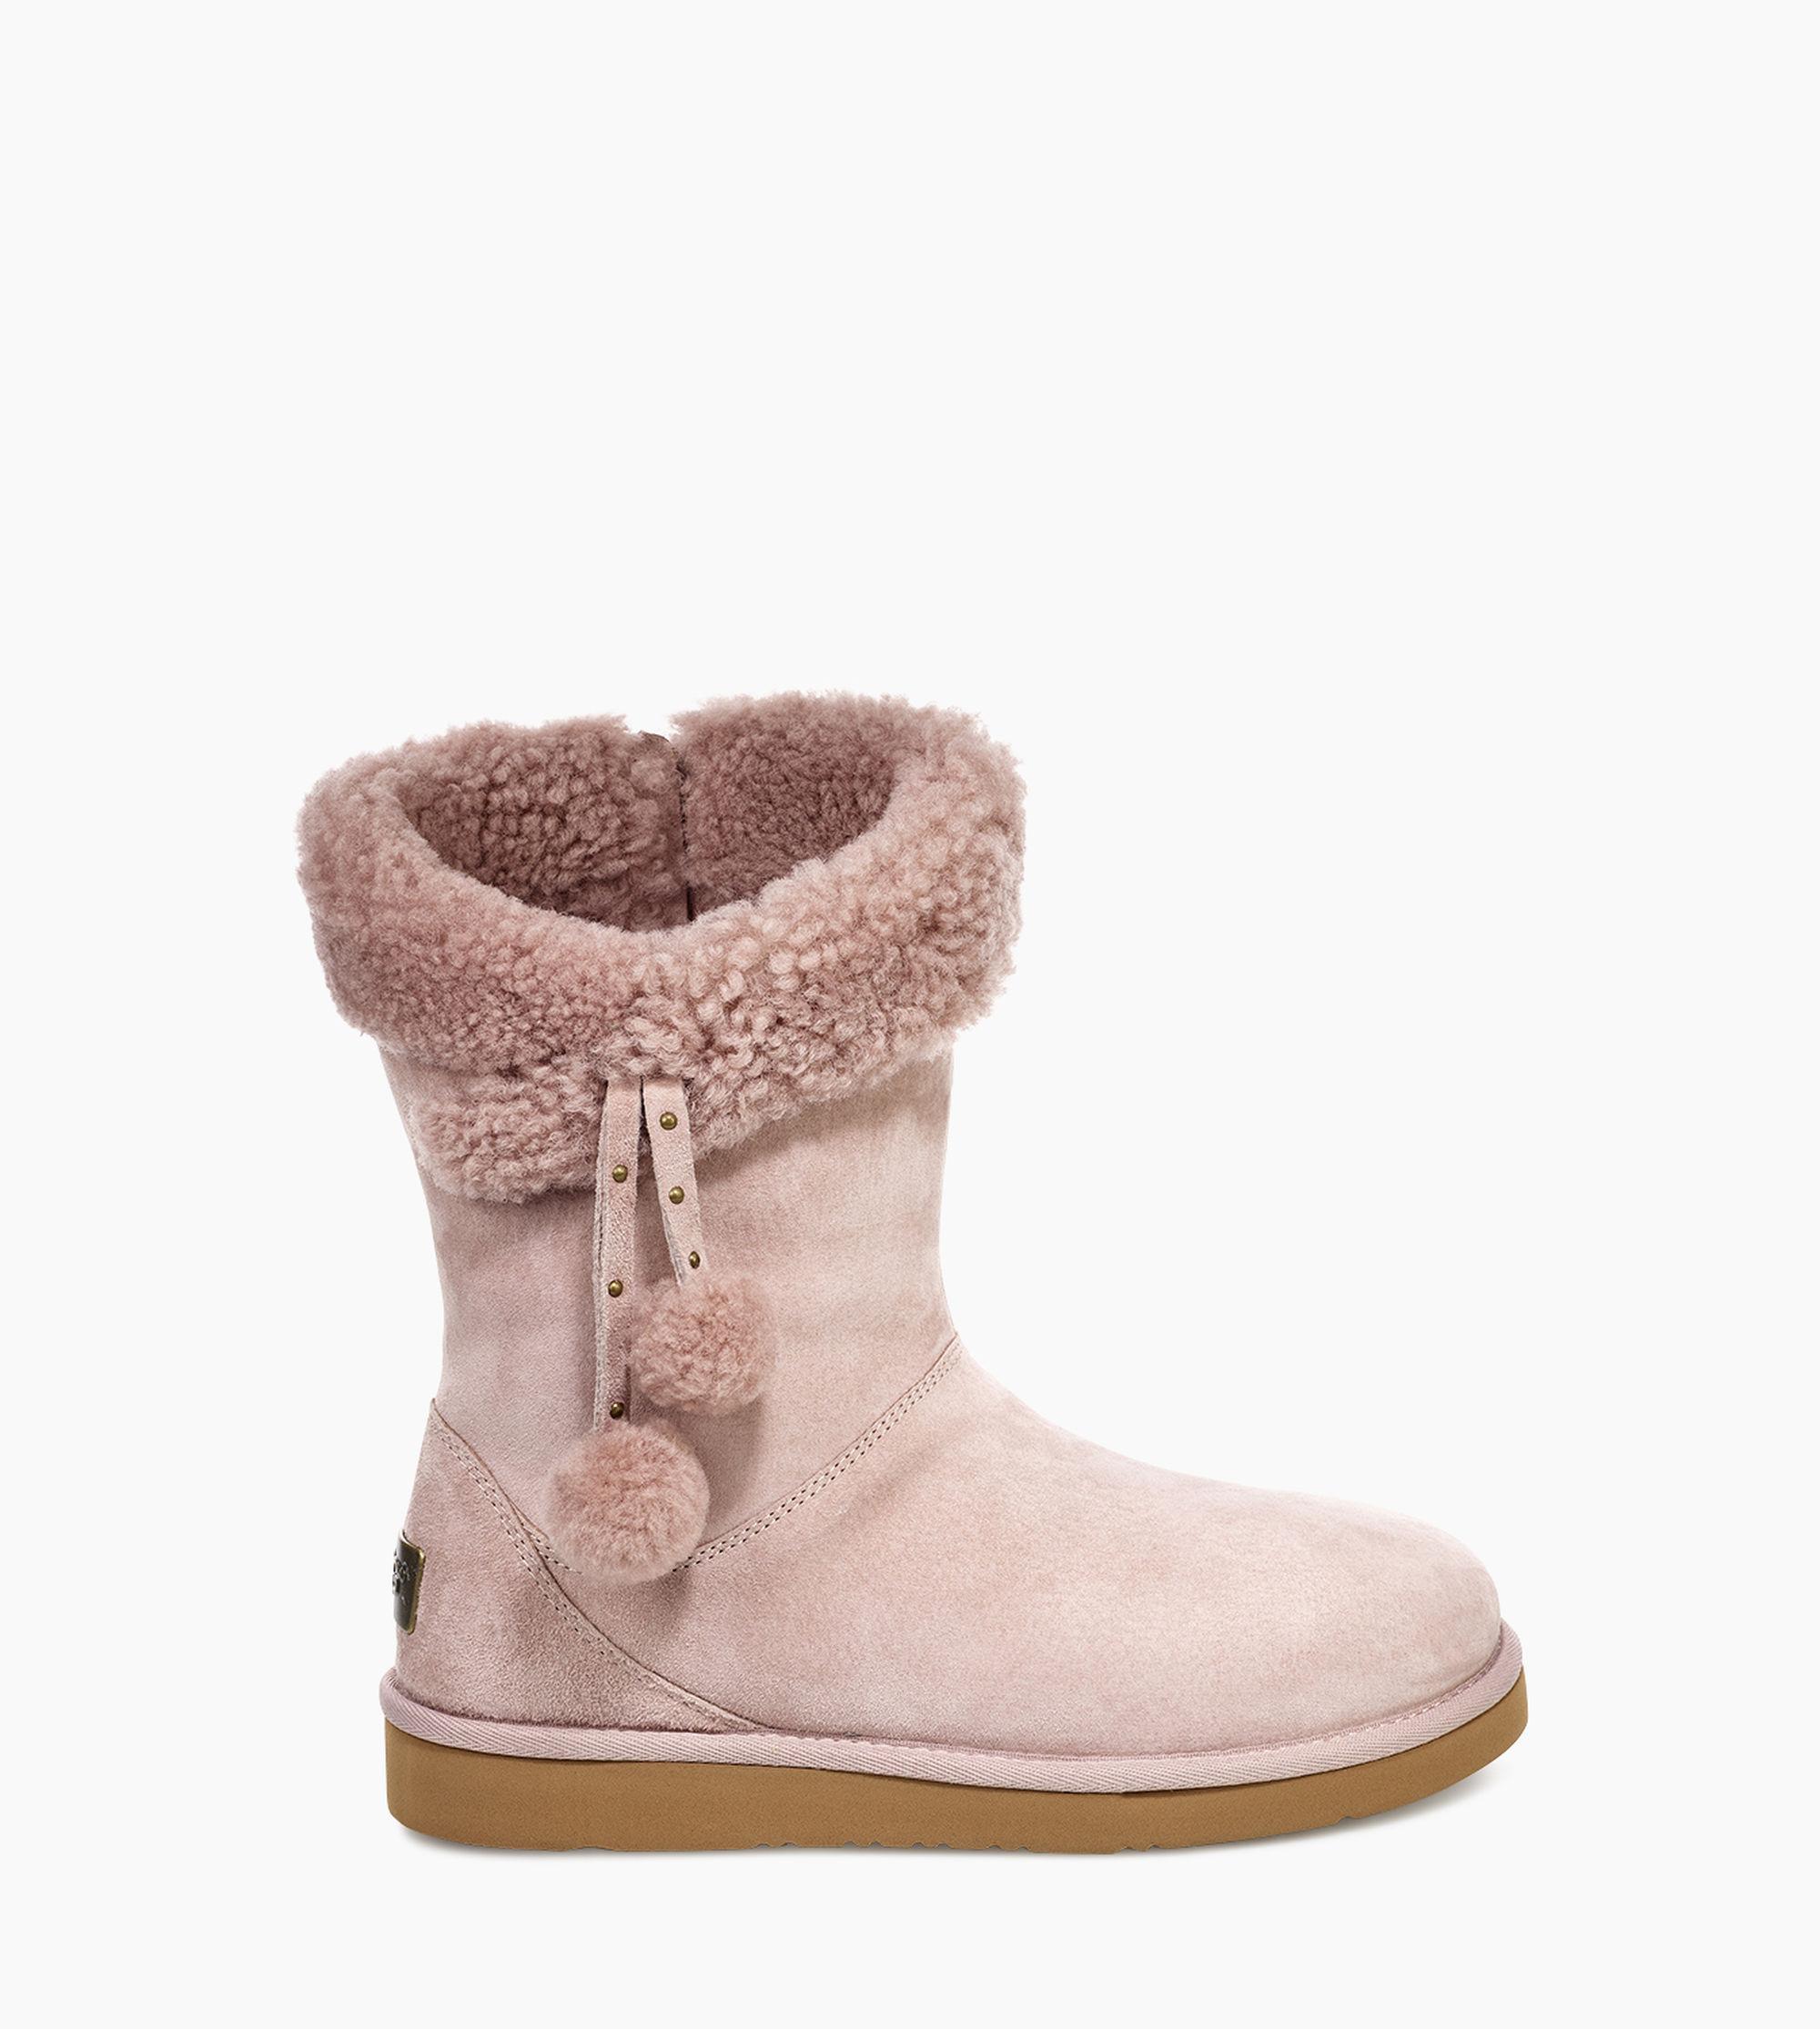 7f697ea6e38 Ugg Pink Plumdale Cuff Short Plumdale Cuff Short